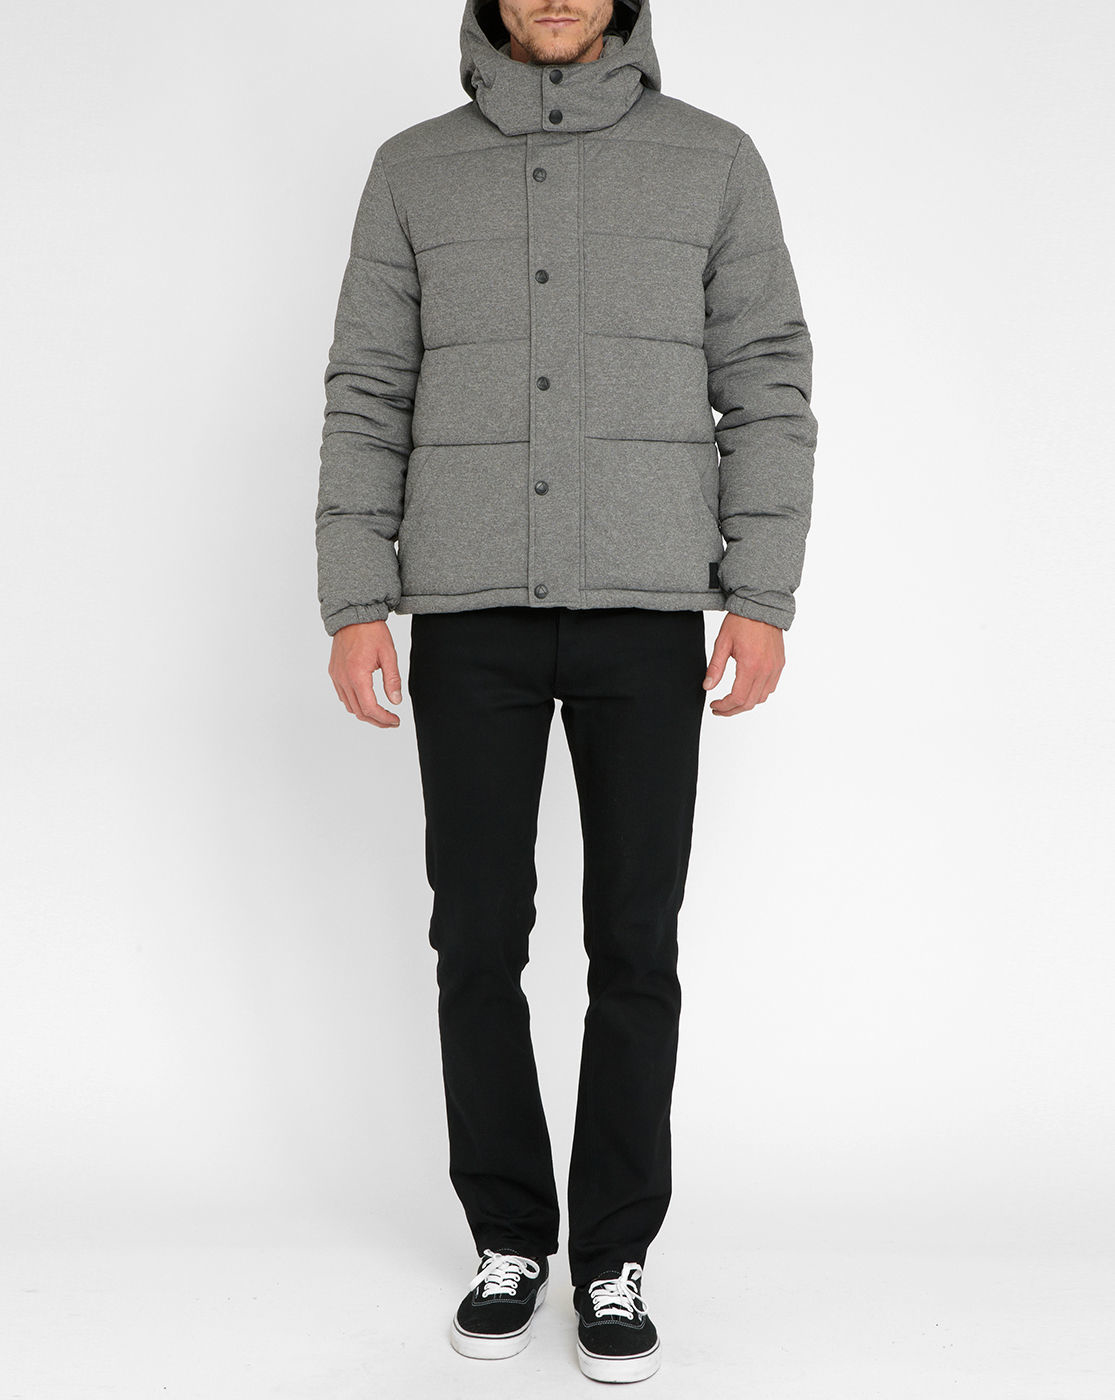 eleven paris mottled grey melco nylon down jacket in gray for men grey lyst. Black Bedroom Furniture Sets. Home Design Ideas